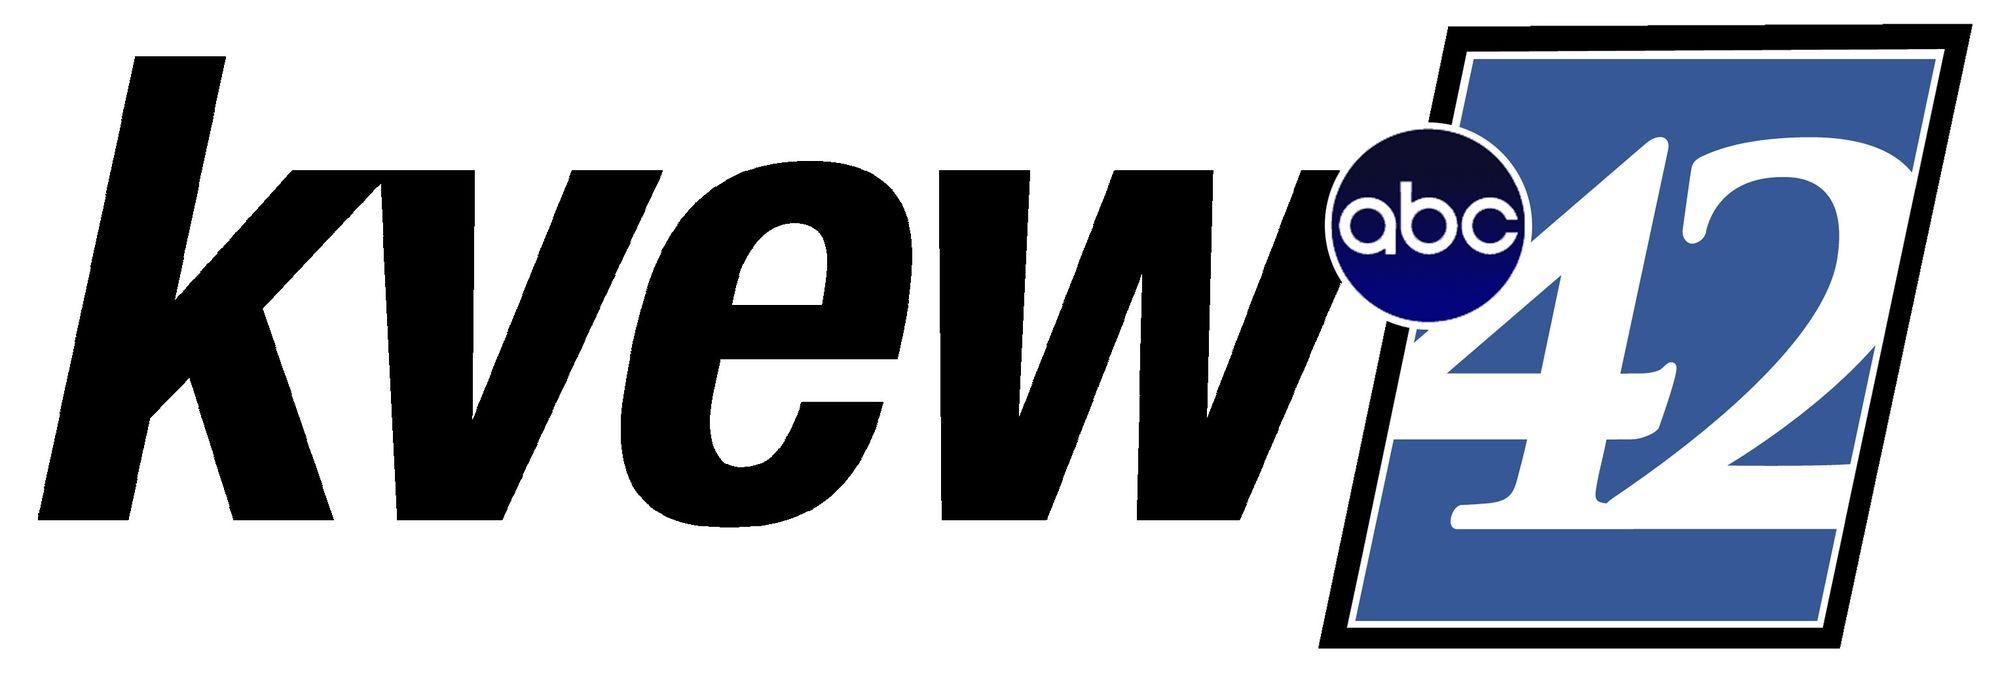 KVEW logo.jpg